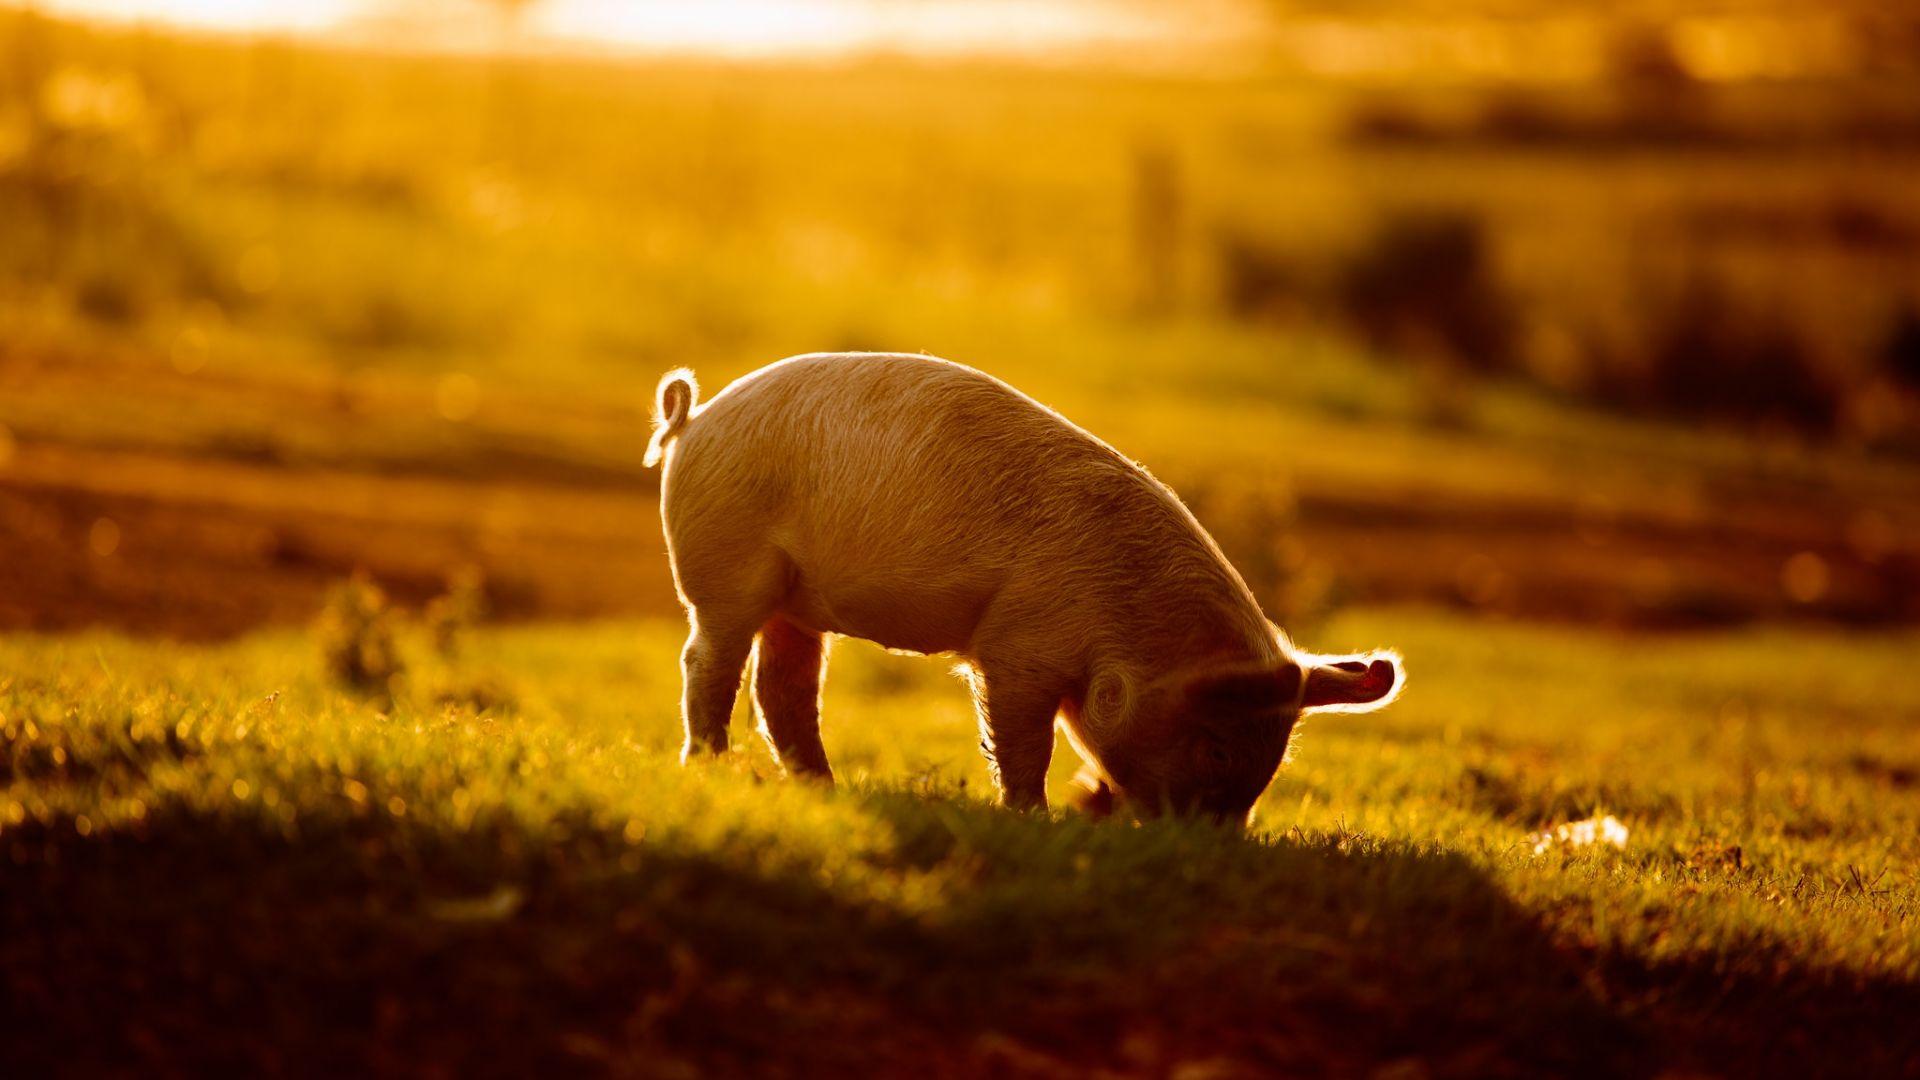 Wallpaper Baby pig, sunlight, landscape